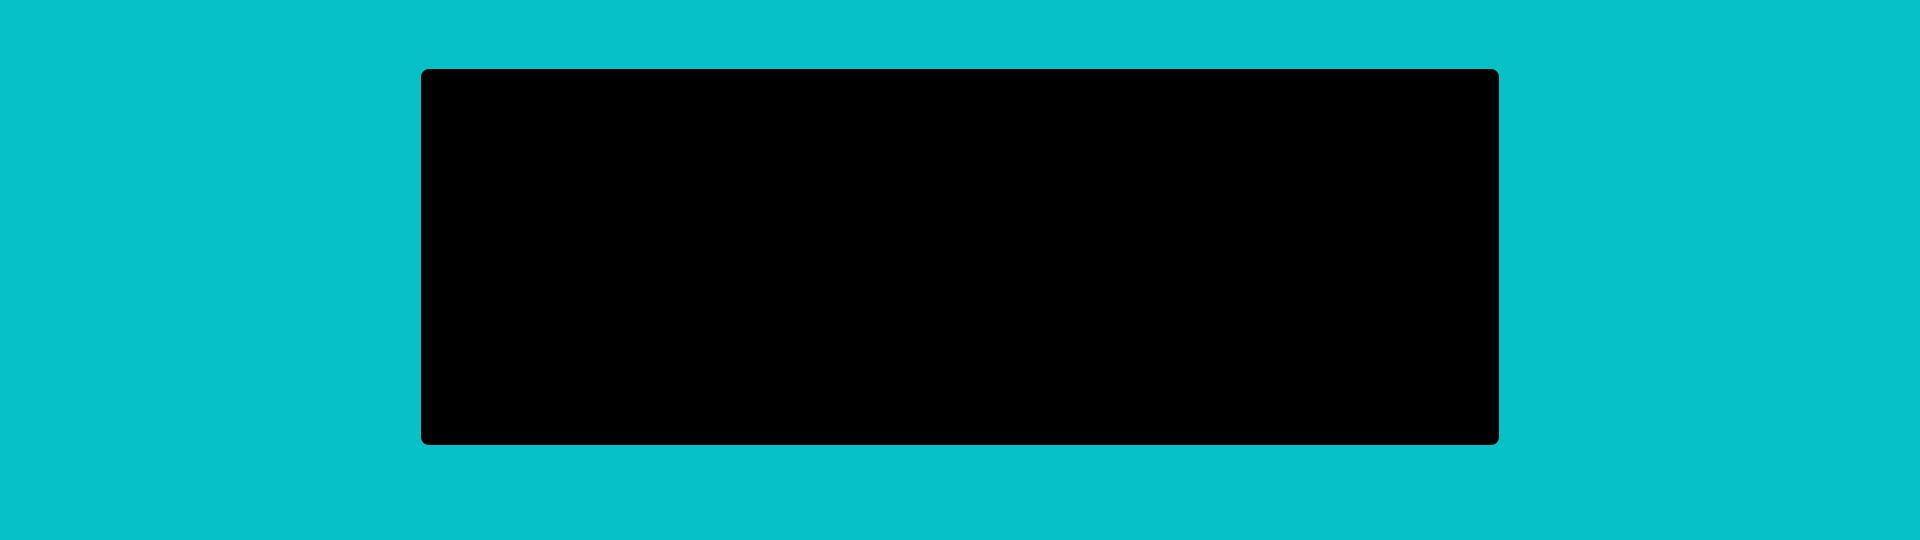 CATEGORY-OYUNKO-2899TLDENBASLAYANFIYATLAR-28-07